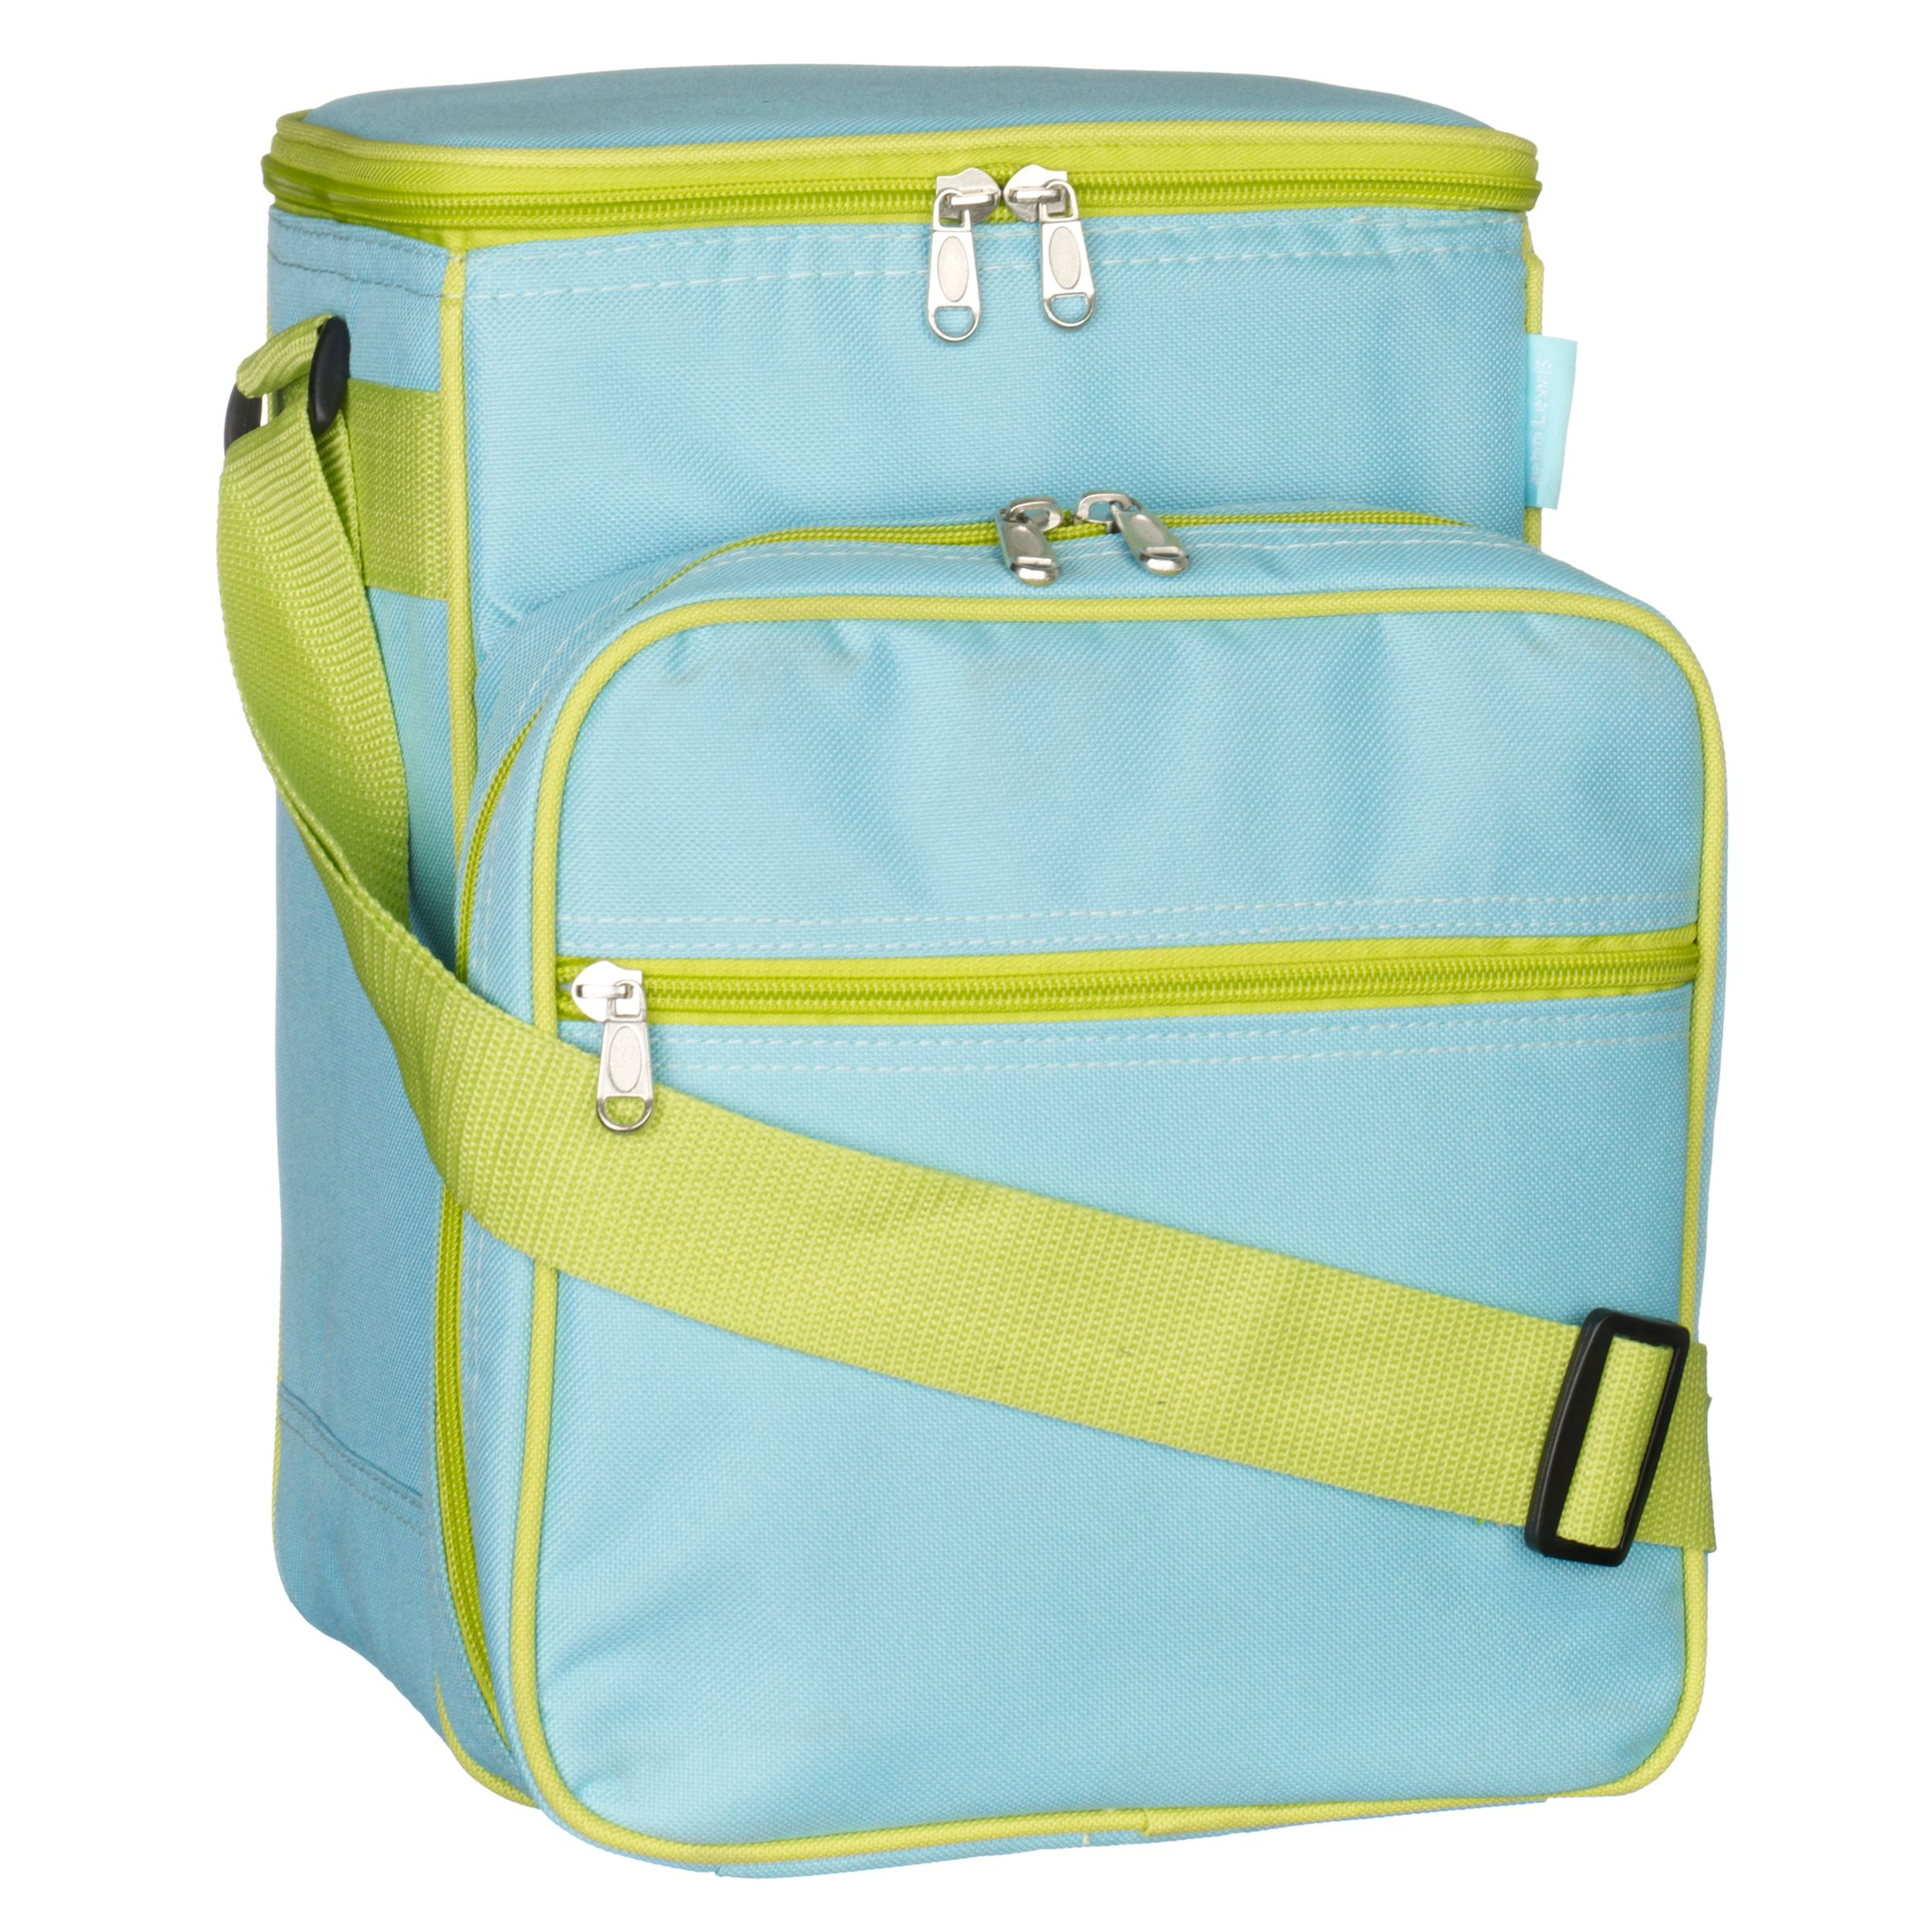 John Lewis 2 Person Picnic Cooler Bag Set, Blue/ Green